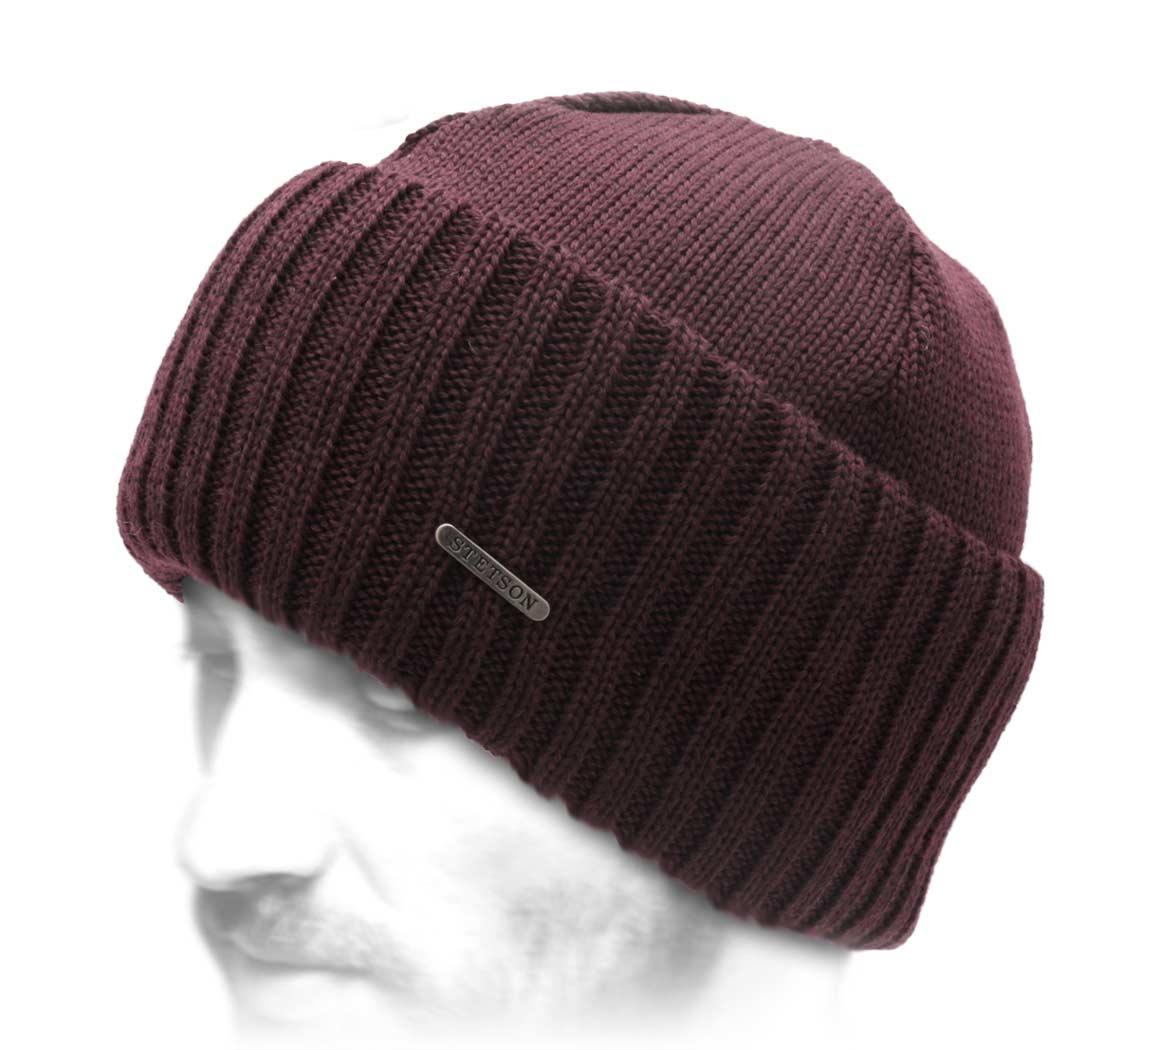 Northport Merino Wool - Beanies Stetson 73a22d9e772e